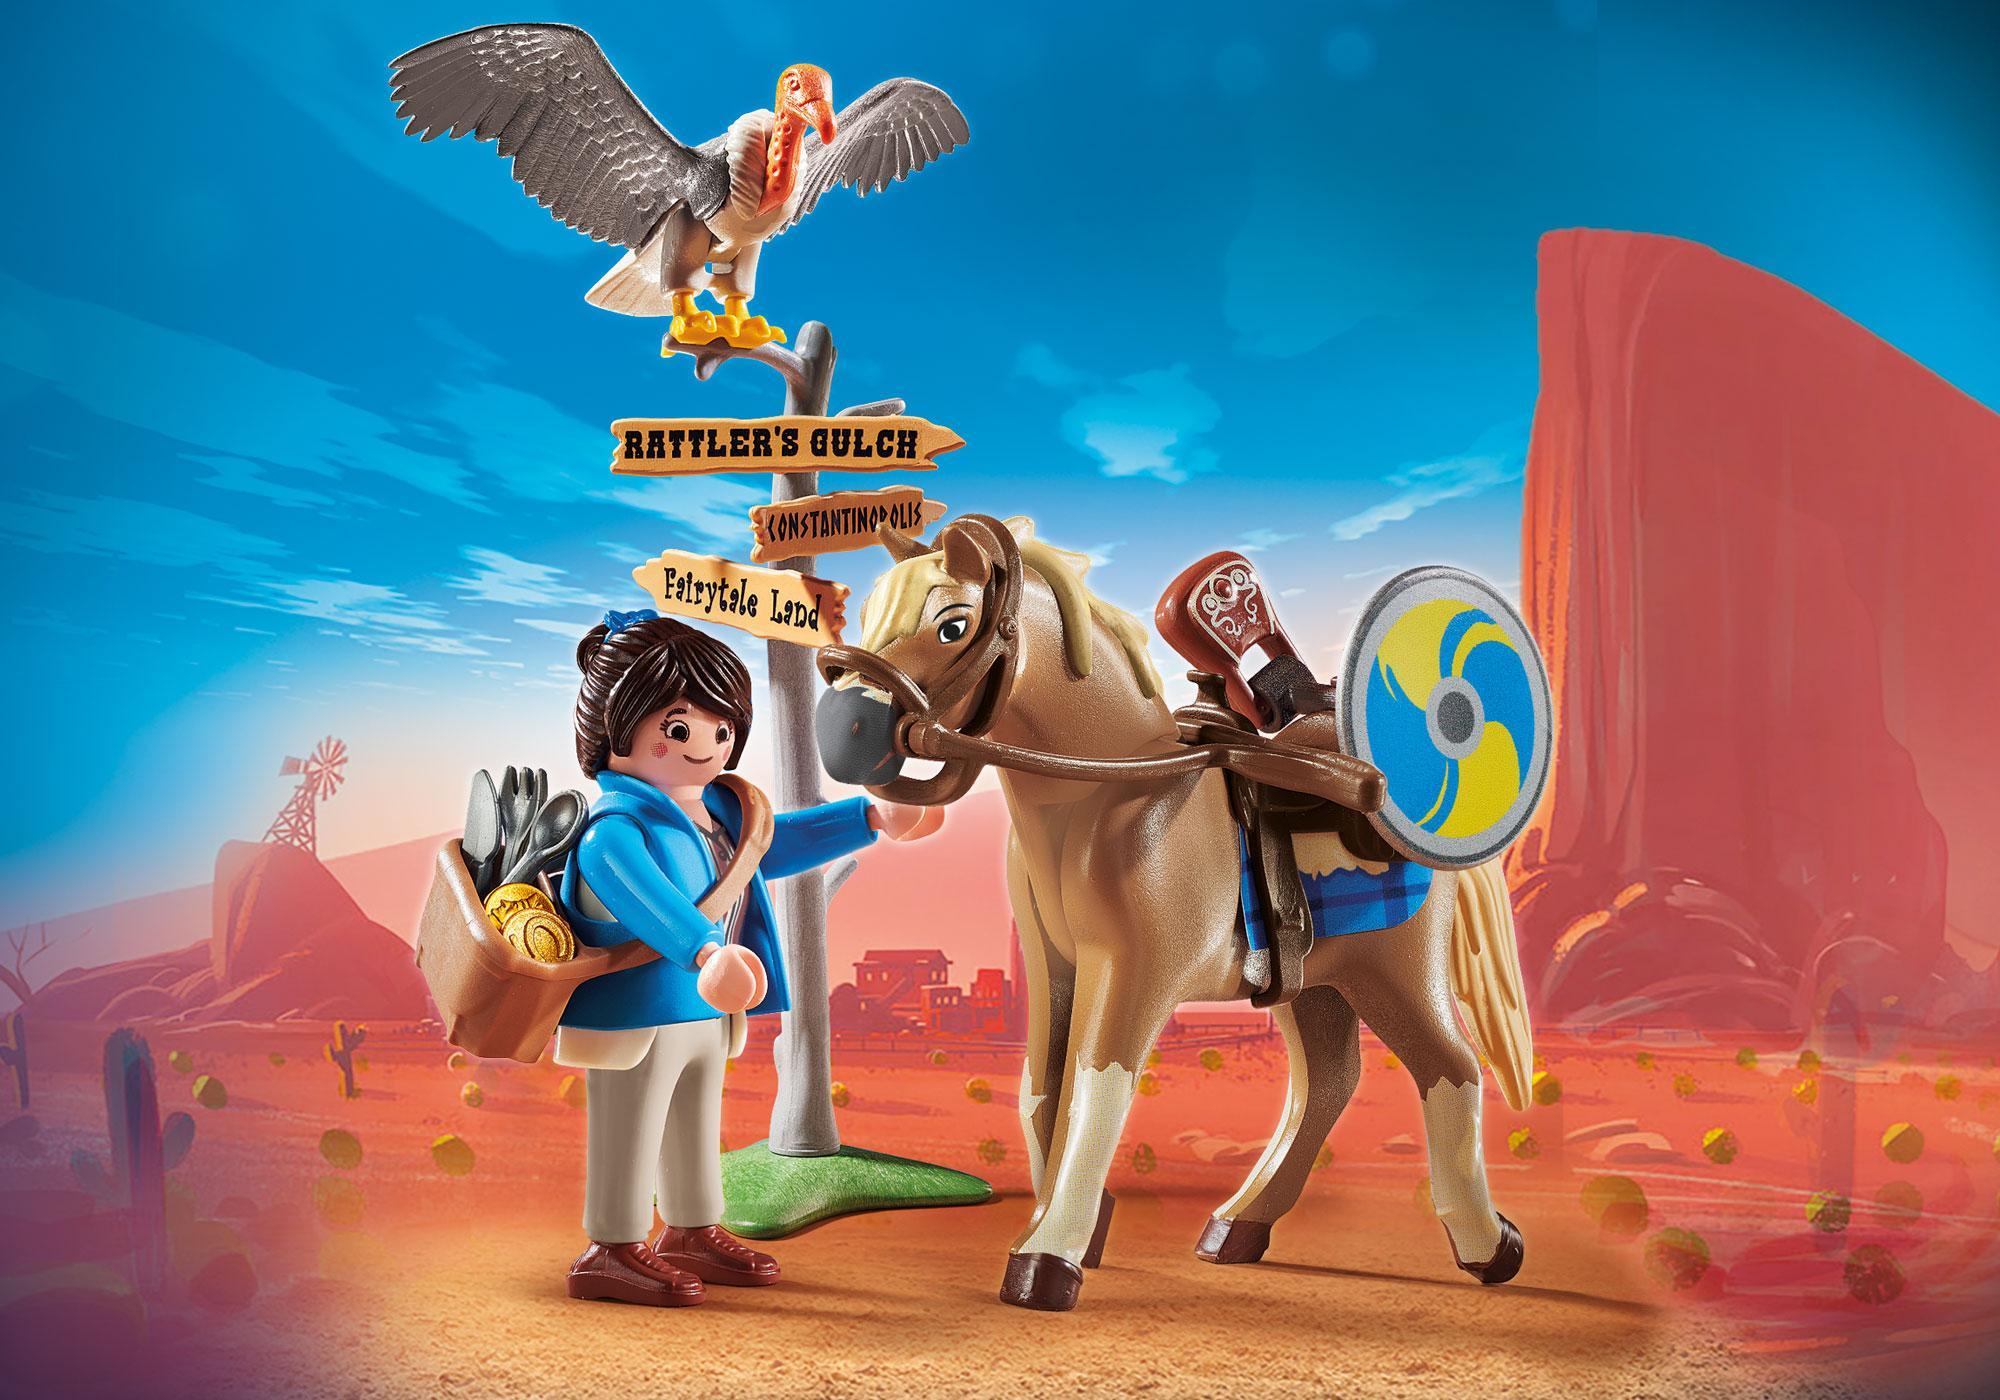 http://media.playmobil.com/i/playmobil/70072_product_detail/PLAYMOBIL:THE MOVIE Marla mit Pferd